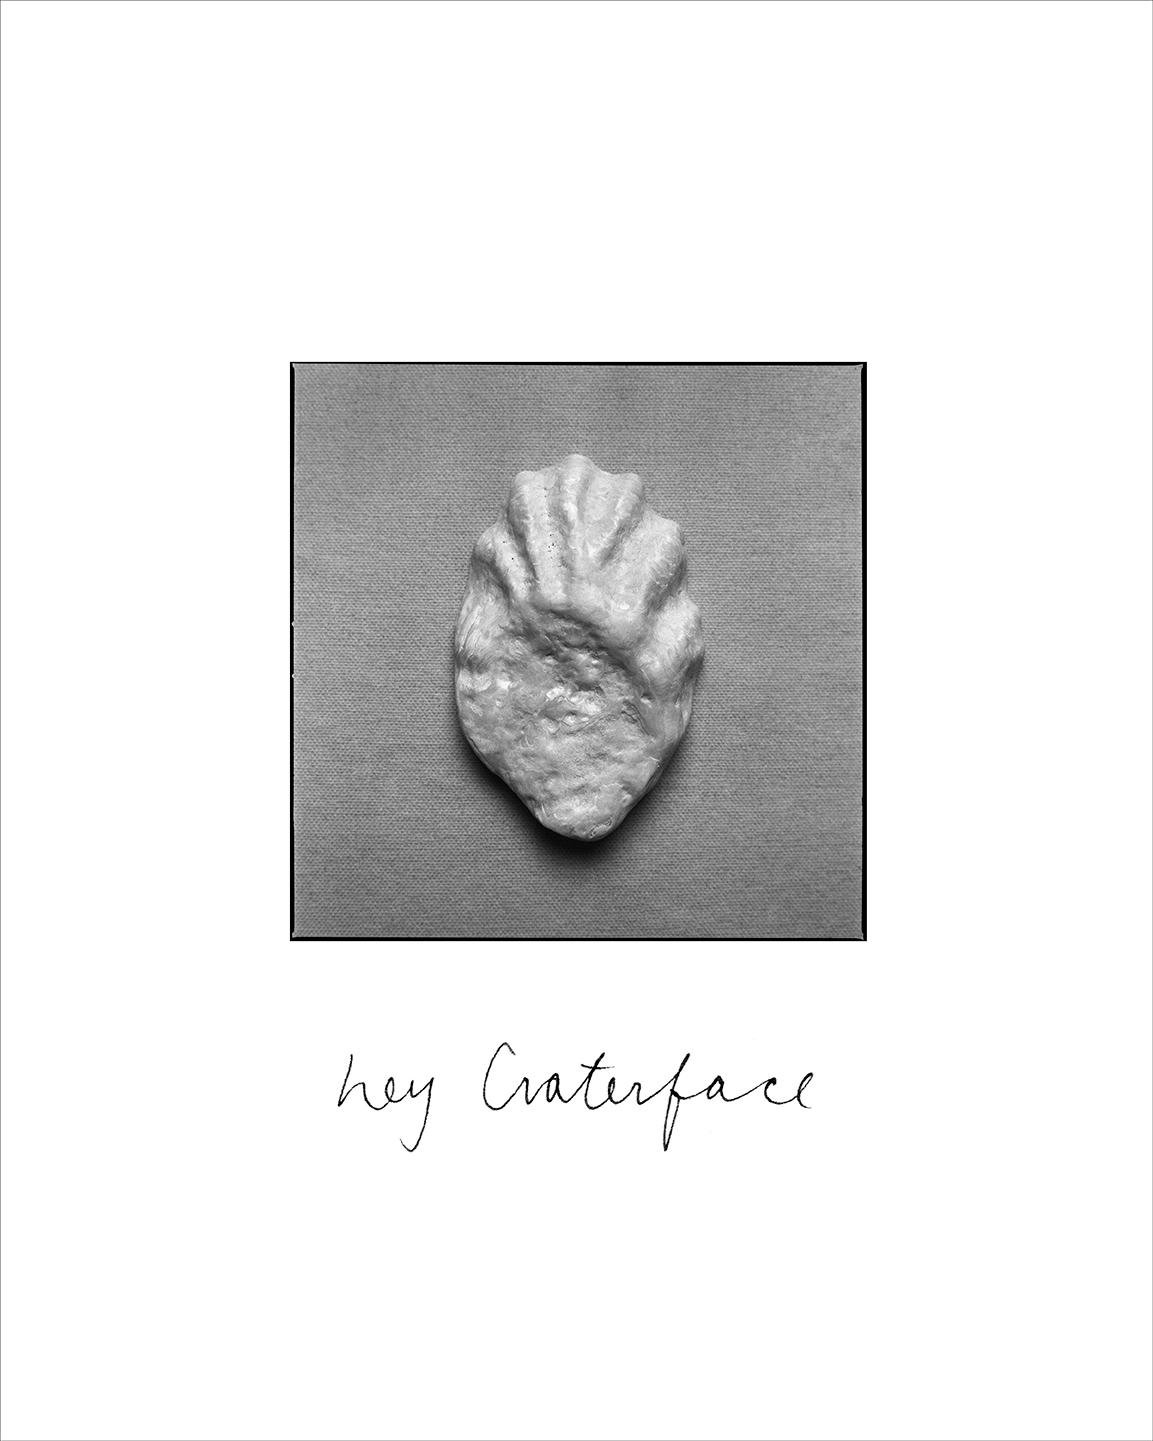 heycraterface5.jpg